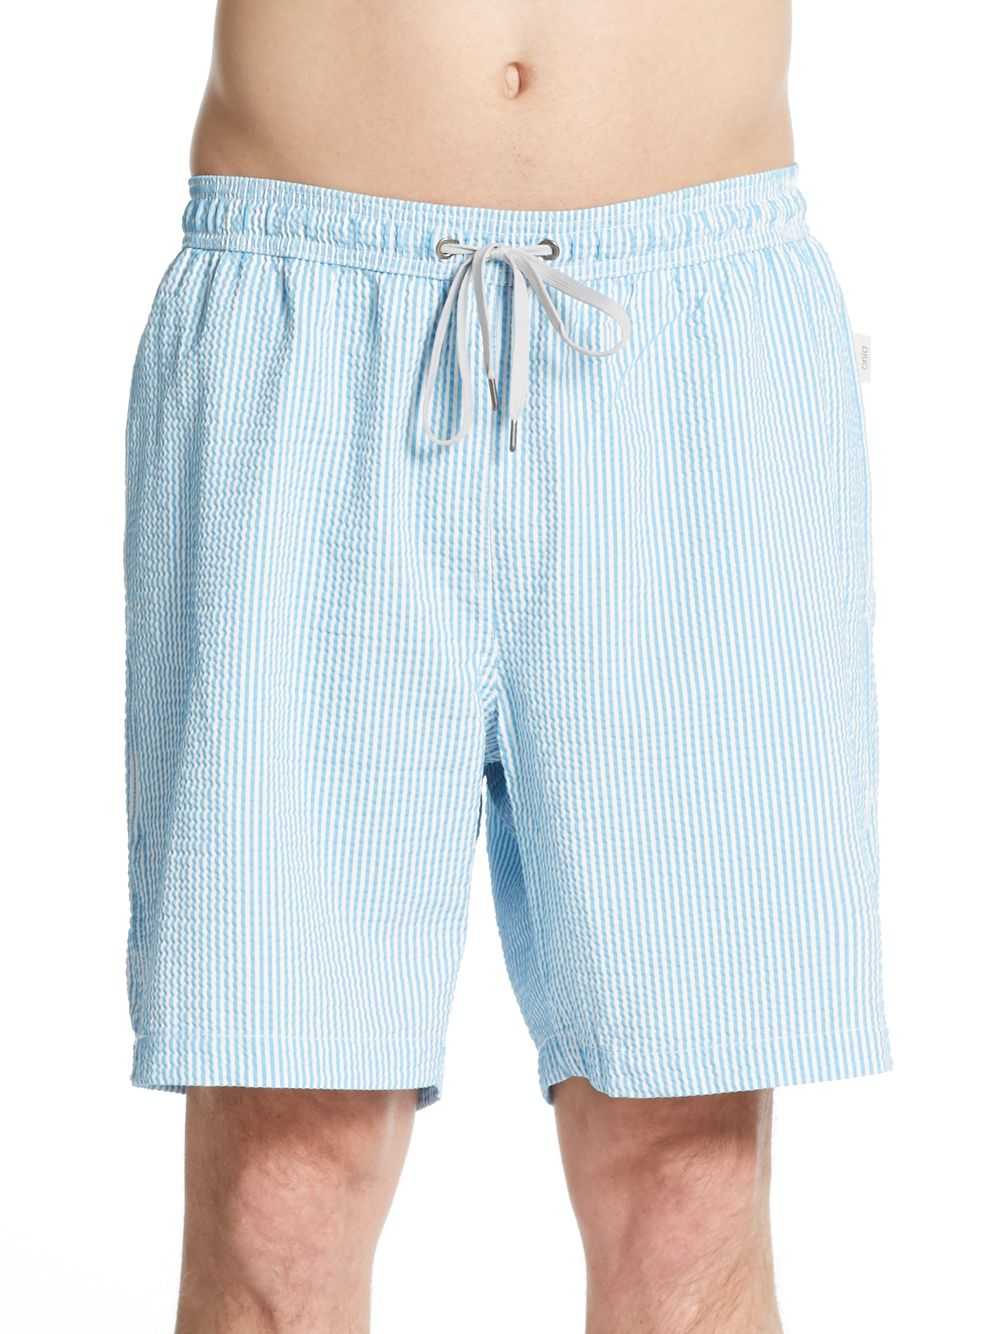 5a1dcc9563 Lyst - Onia Charles Striped Seersucker Swim Trunks in Blue for Men